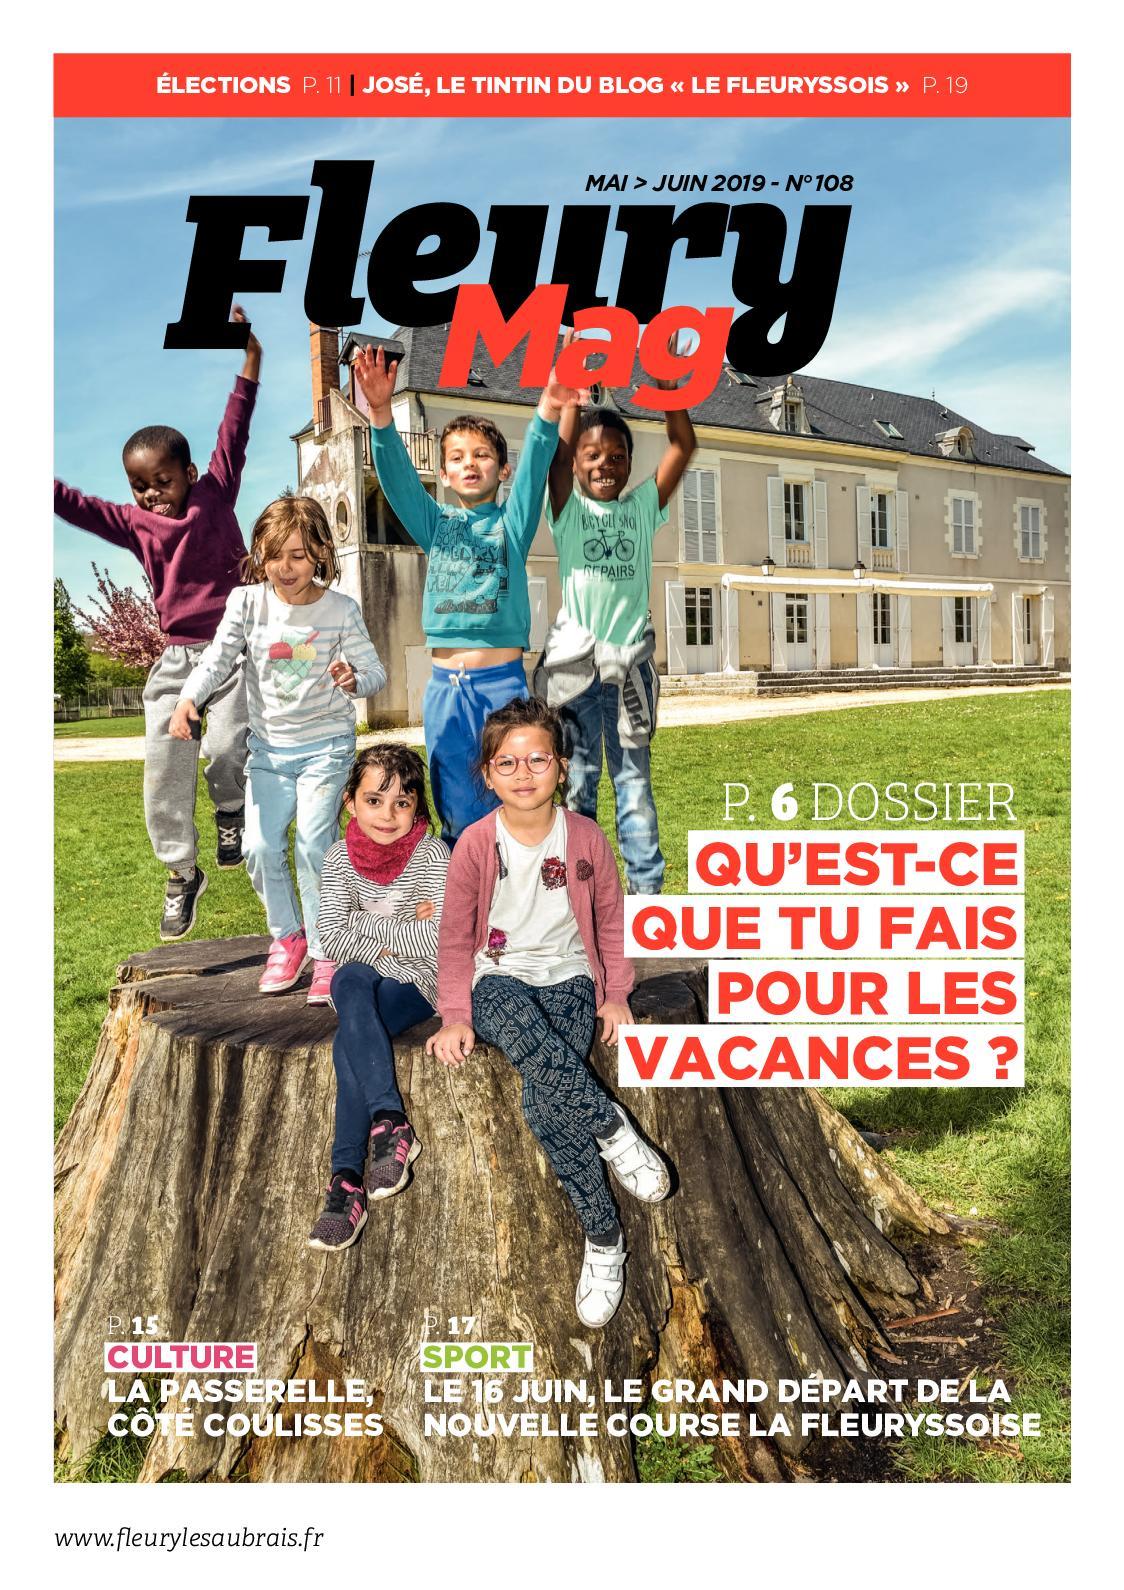 Le Fleury magazine n° 107 - mai-juin 2019